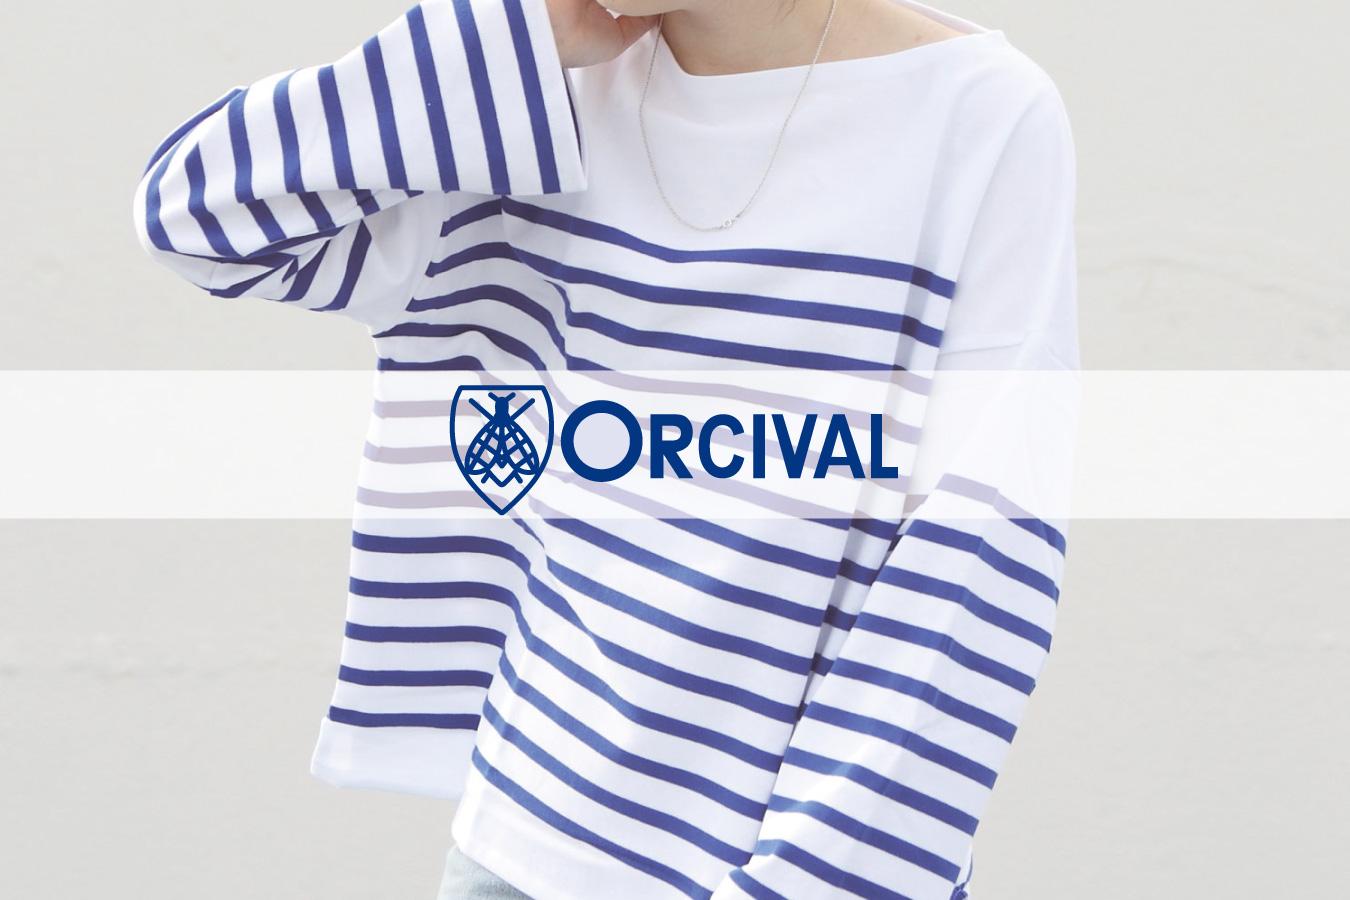 ORCIVAL ラッセルシリーズ絶賛好評予約受付中!!